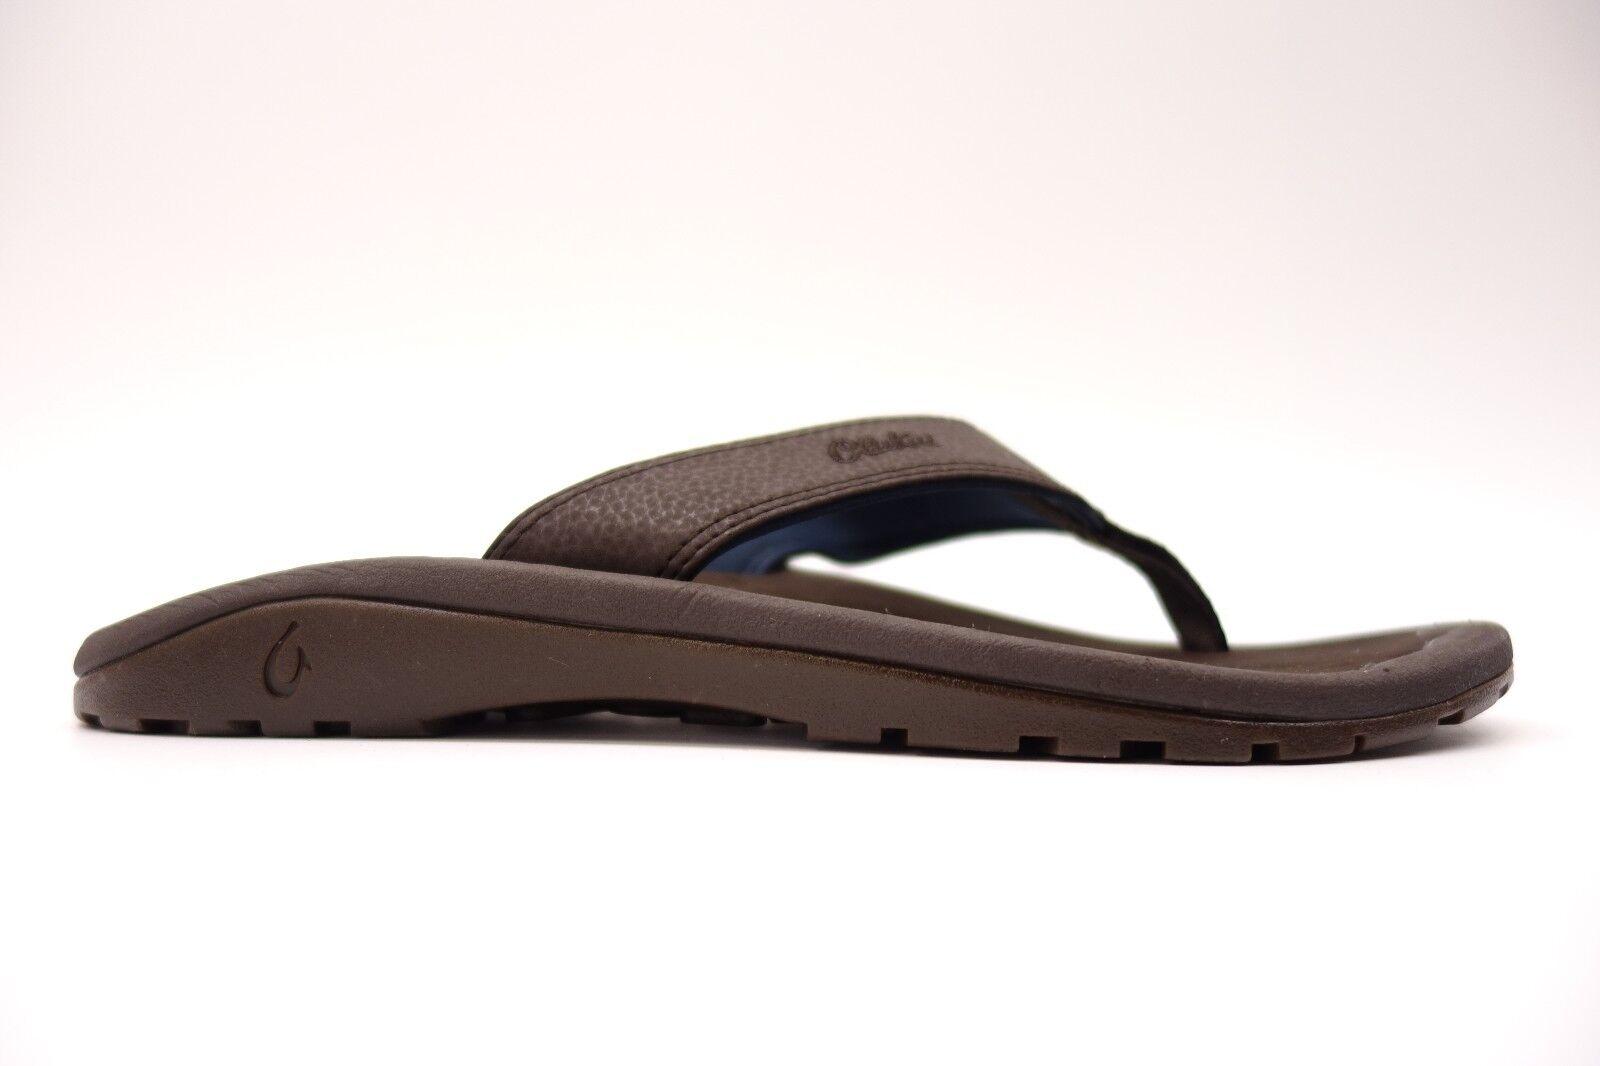 OluKai Shoes Mens Ohana Casual Comfort Slip On Cushioned Slipper Shoes OluKai Size 10 2b03fc